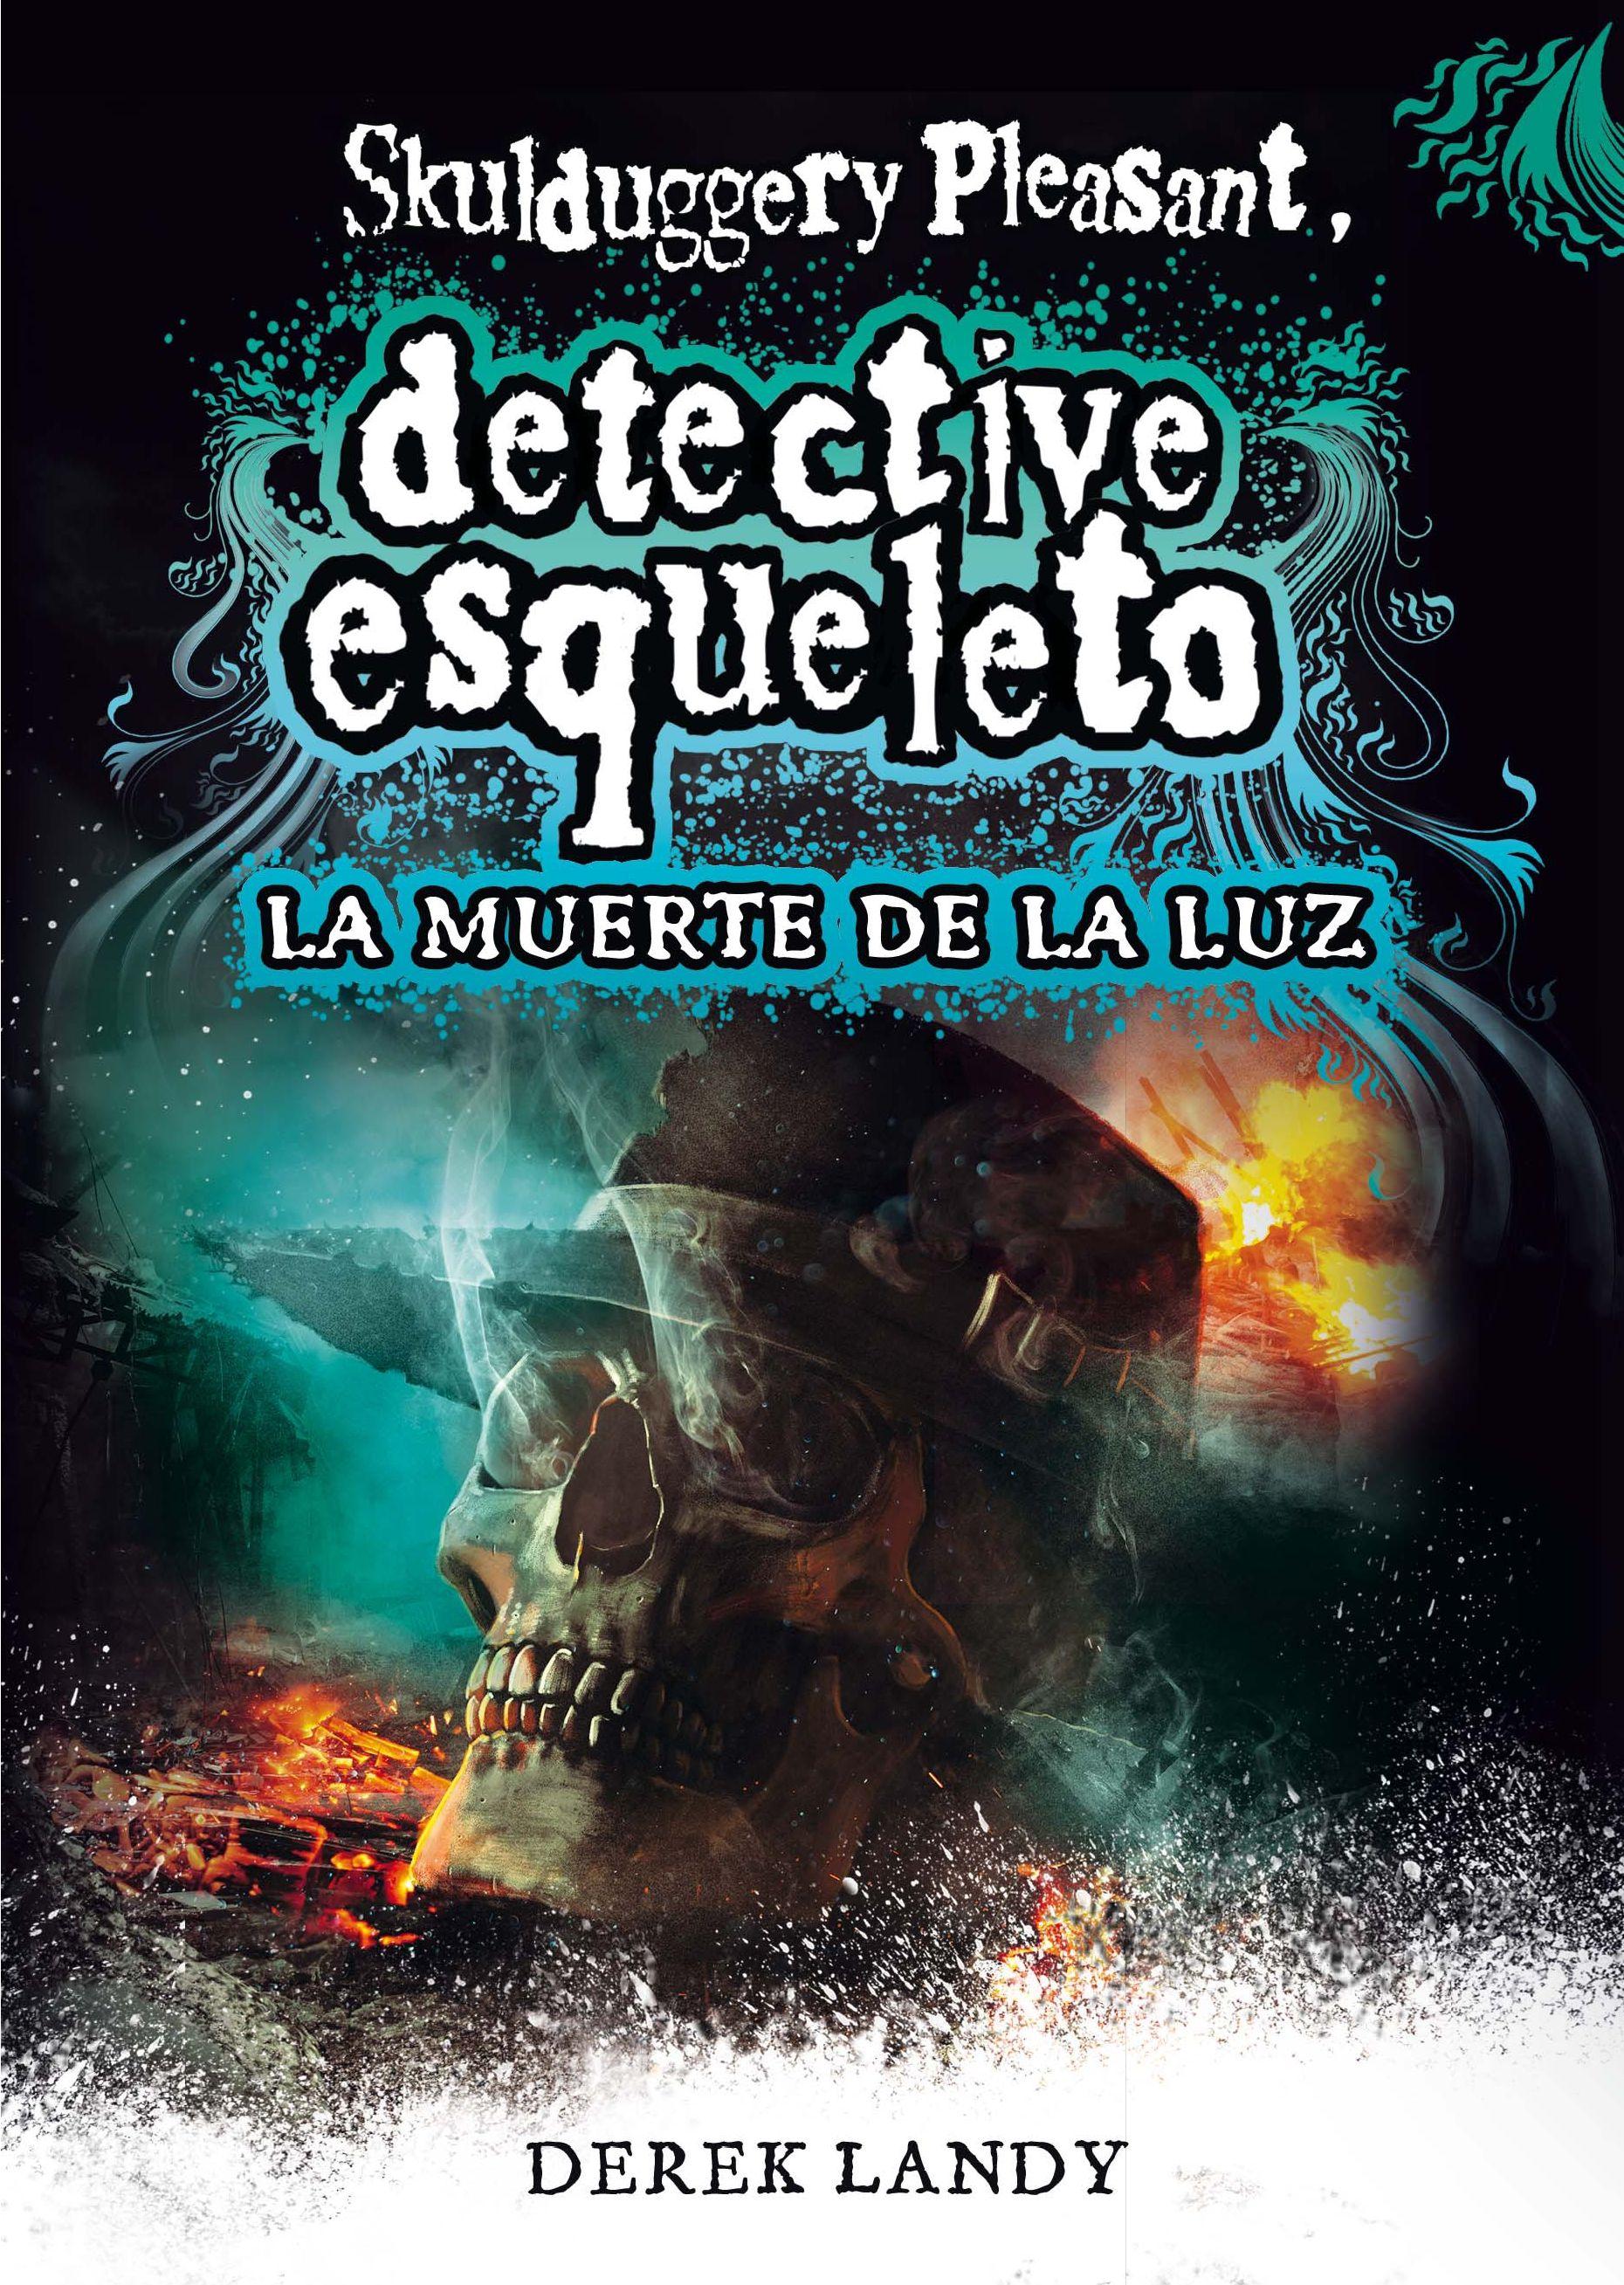 DETECTIVE ESQUELETO 9 LA MUERTE DE LA LUZ